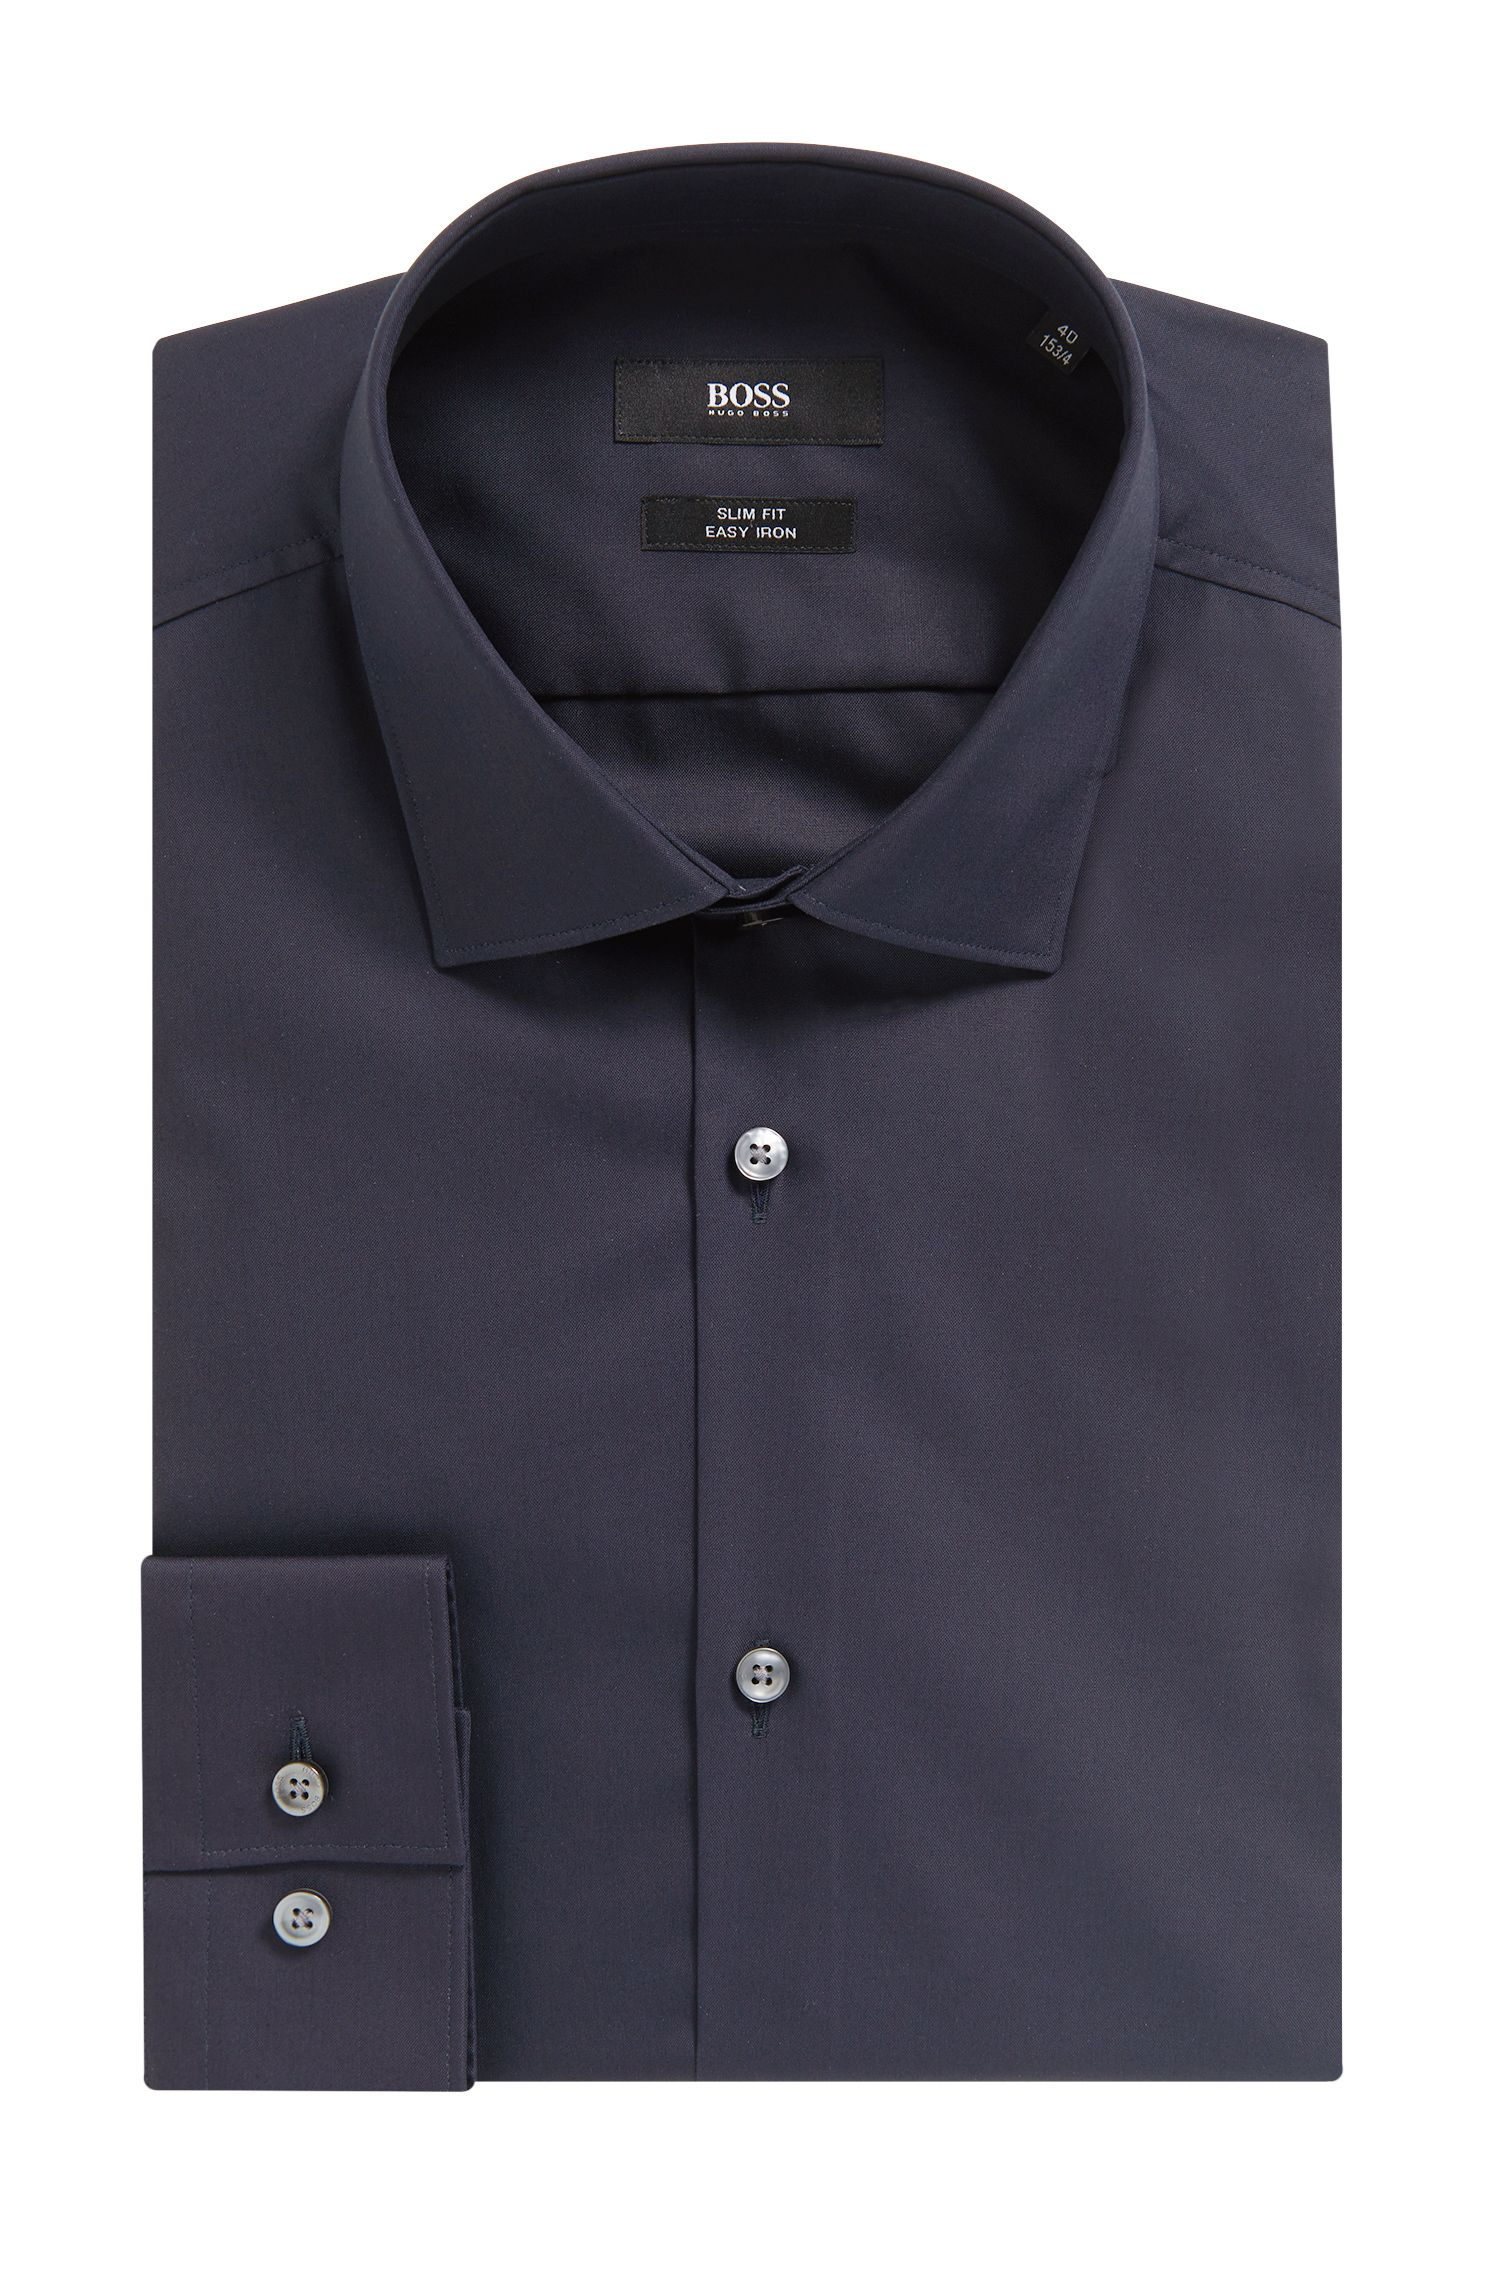 'Ismo' | Slim Fit, Easy Iron Cotton Dress Shirt